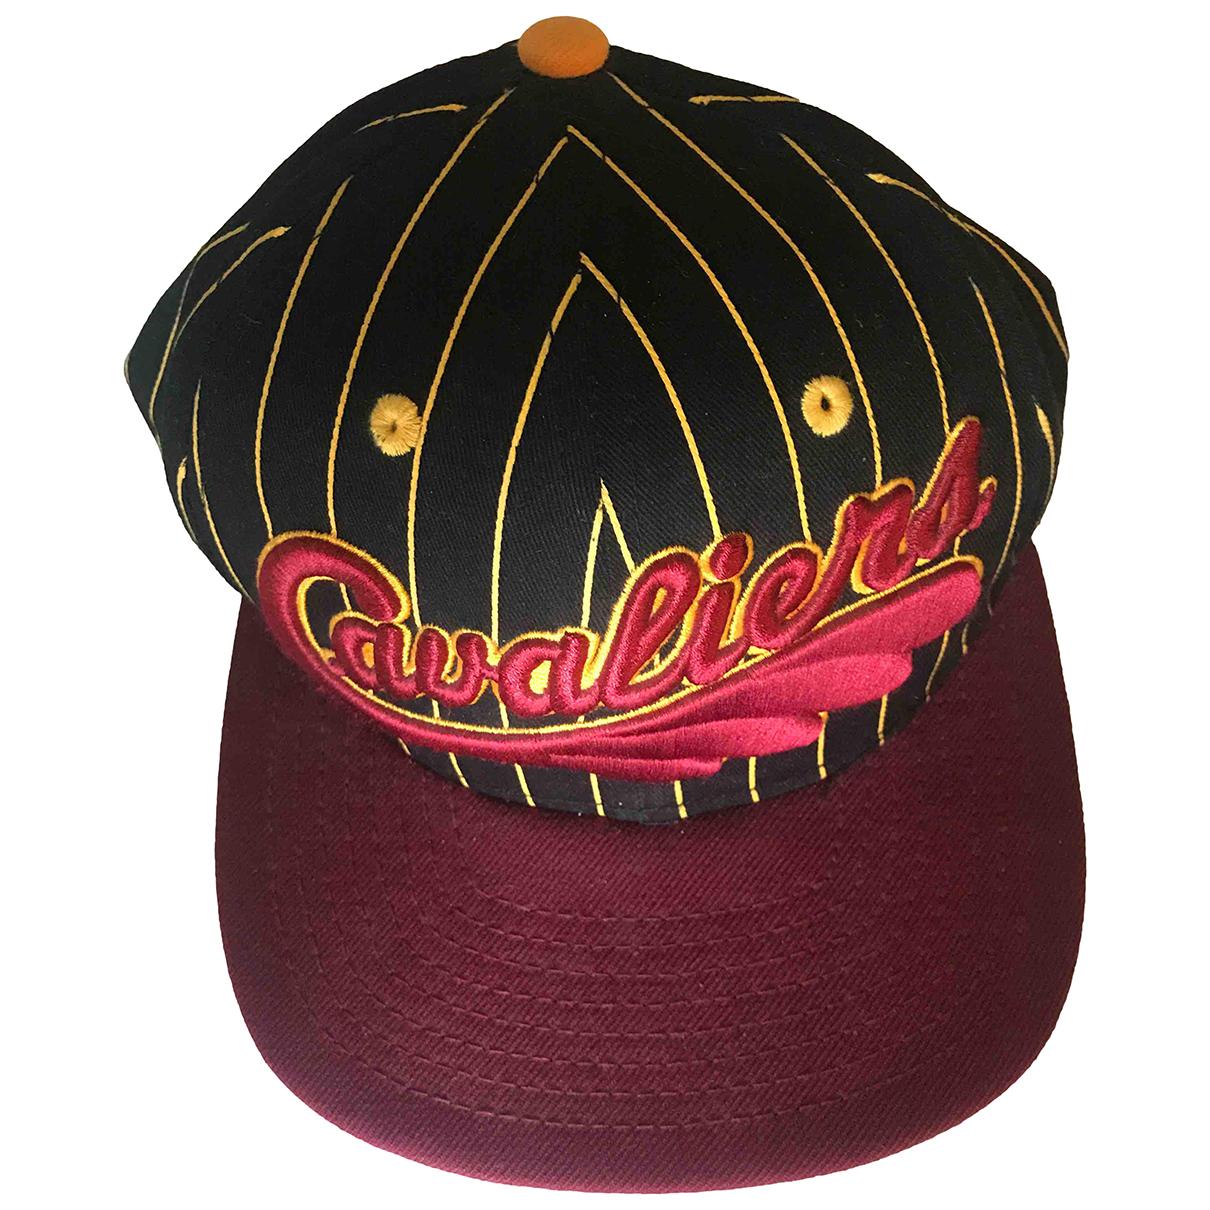 Autre Marque N Burgundy Cotton hat & pull on hat for Men 58 cm